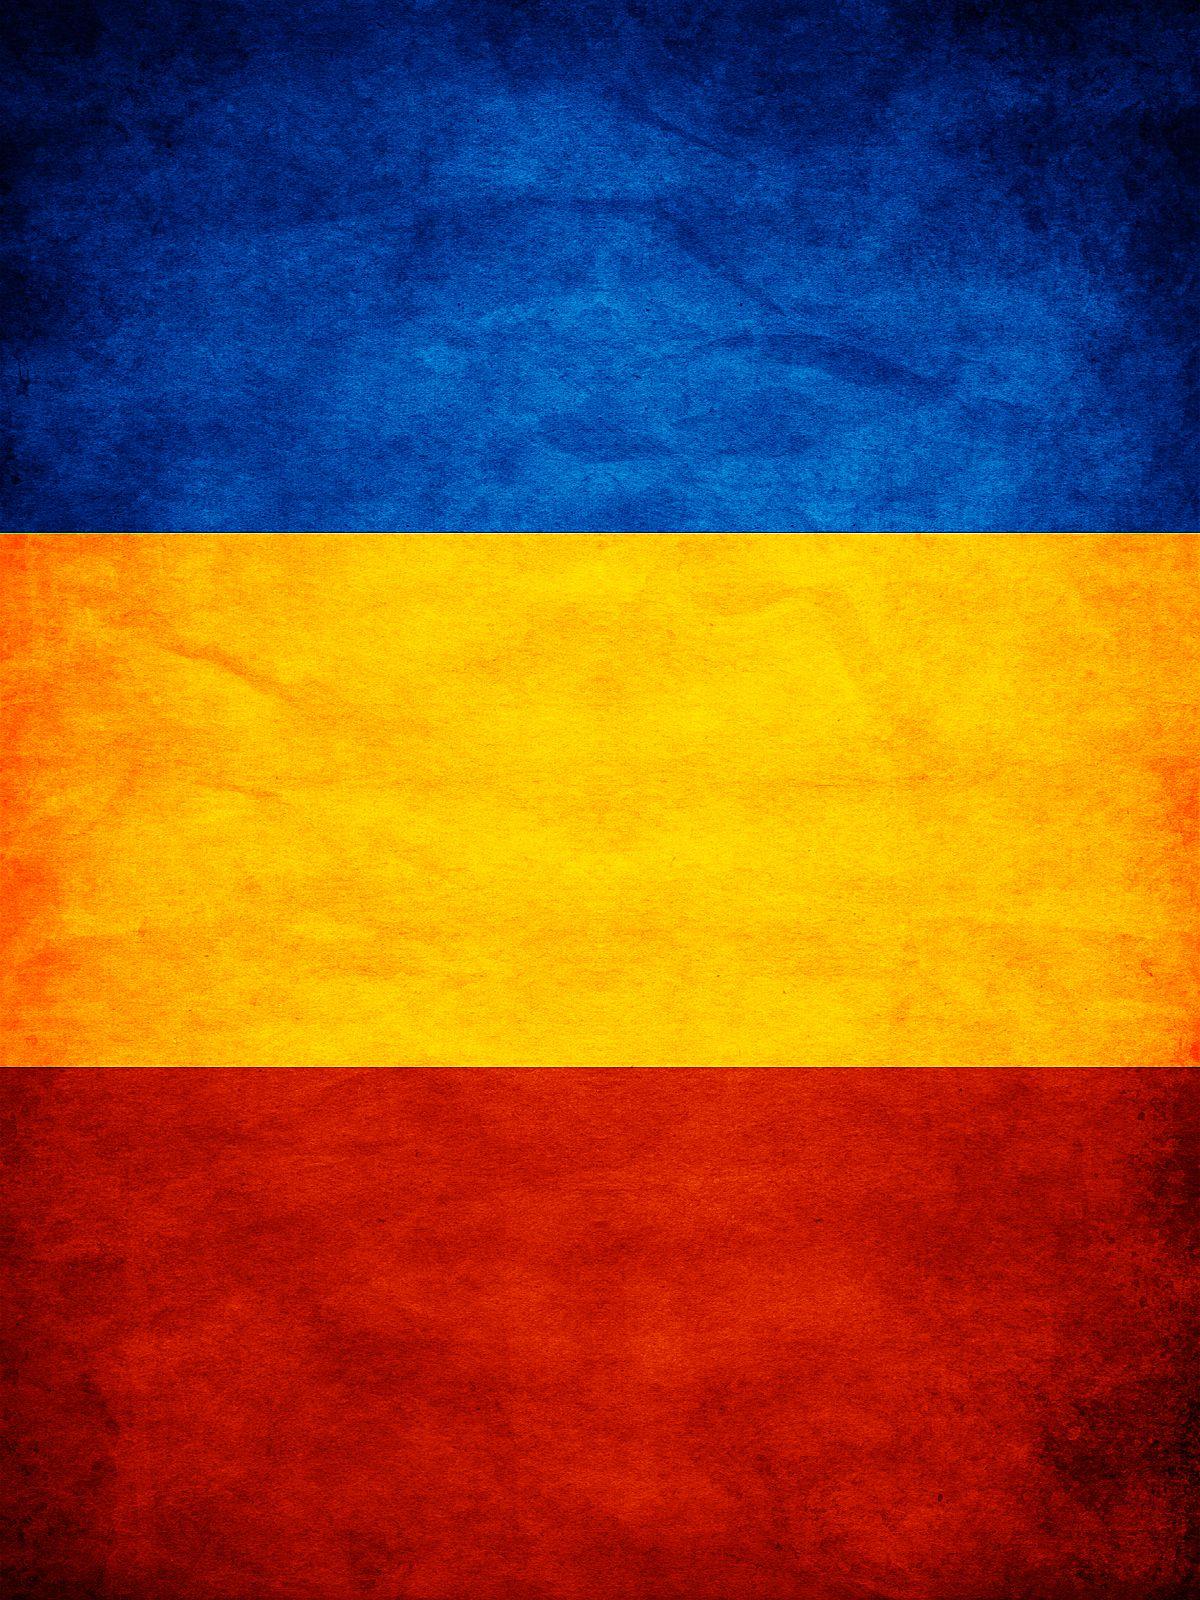 România Romanian Flag Wallpaper Rumania Rumania